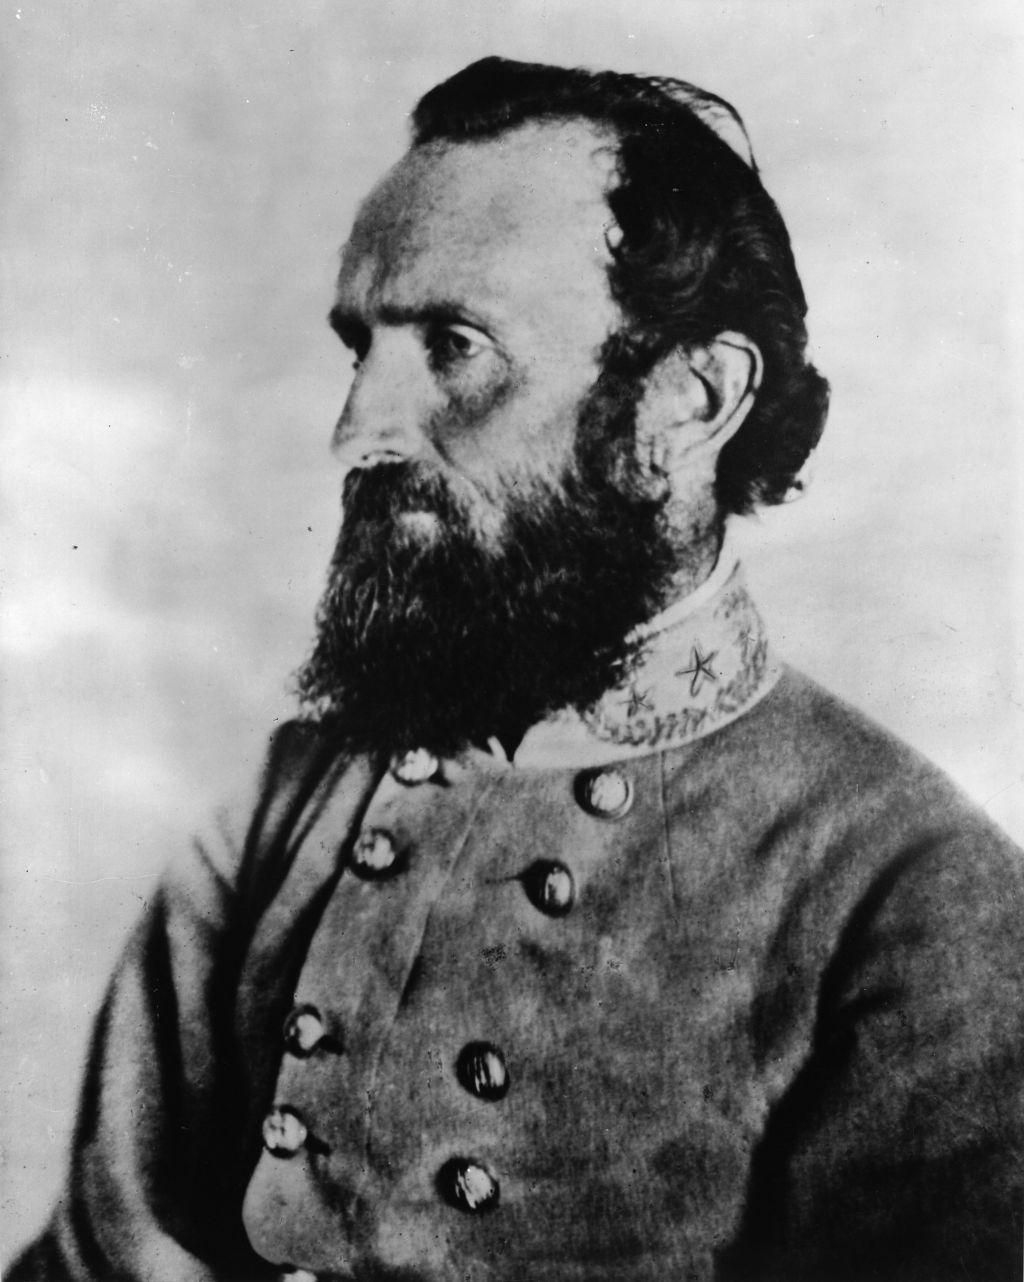 the legendary general stonewall jackson